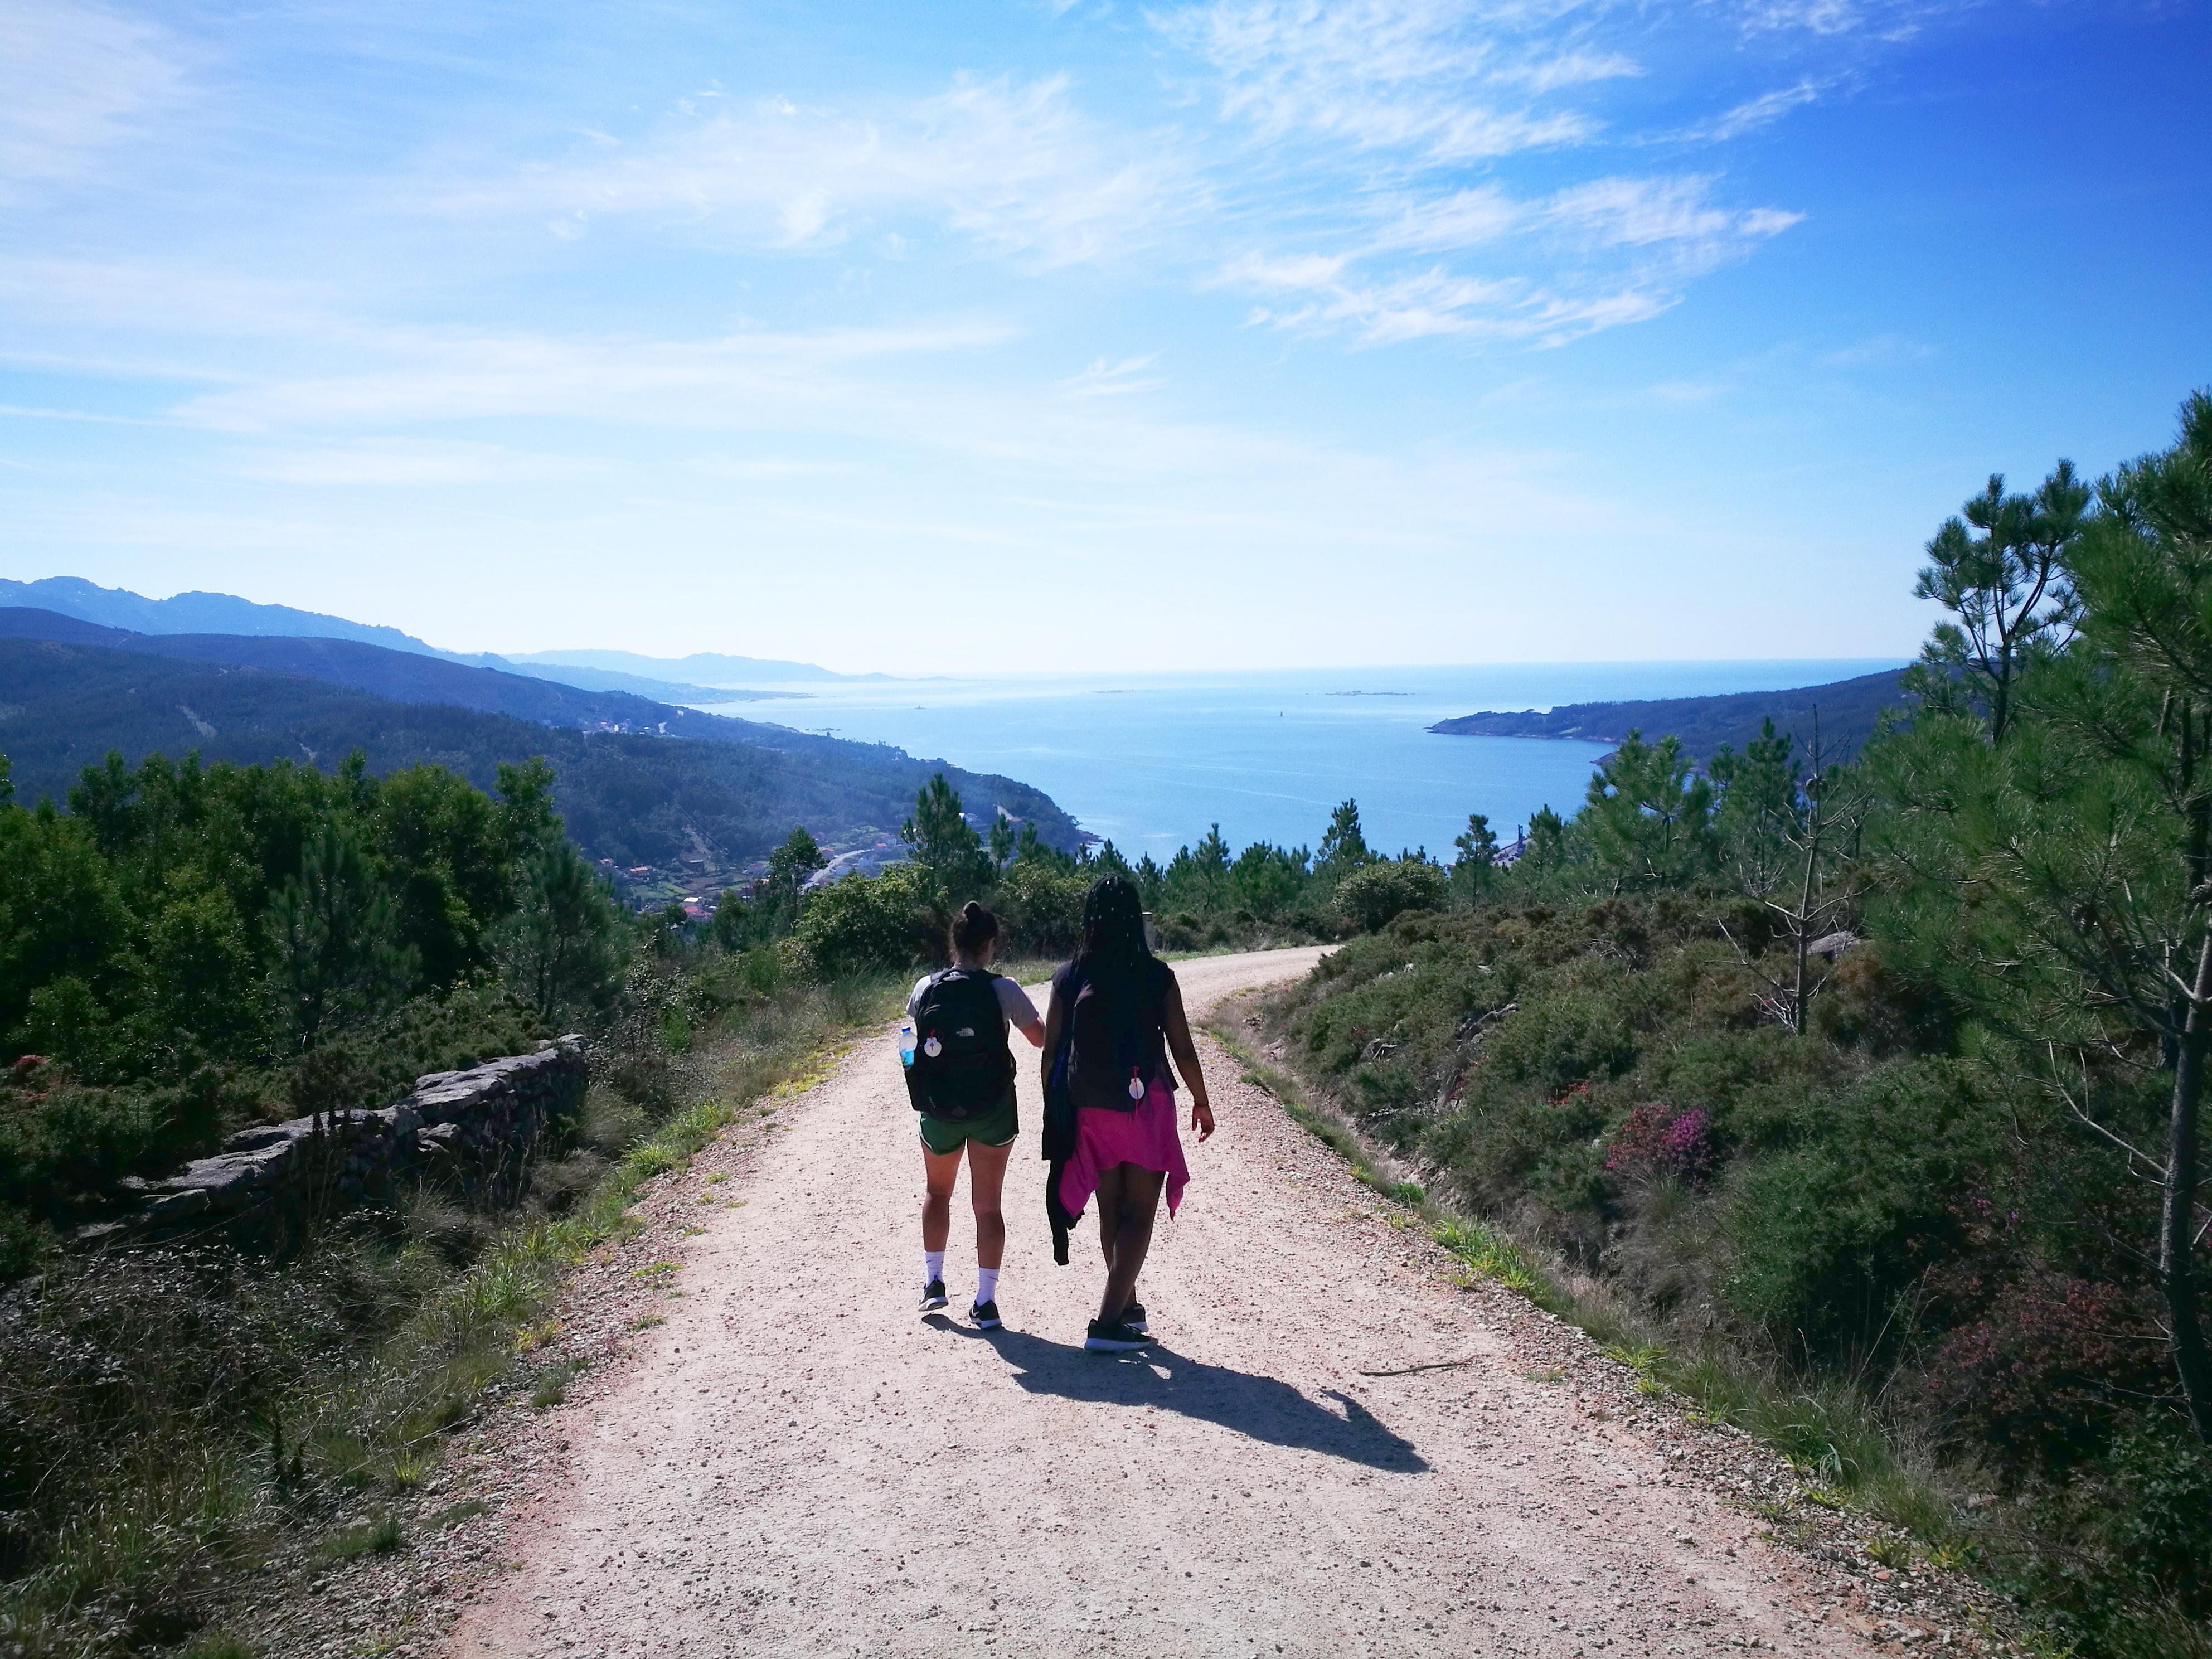 Proctor en Segovia hikes the Camino de Santiago